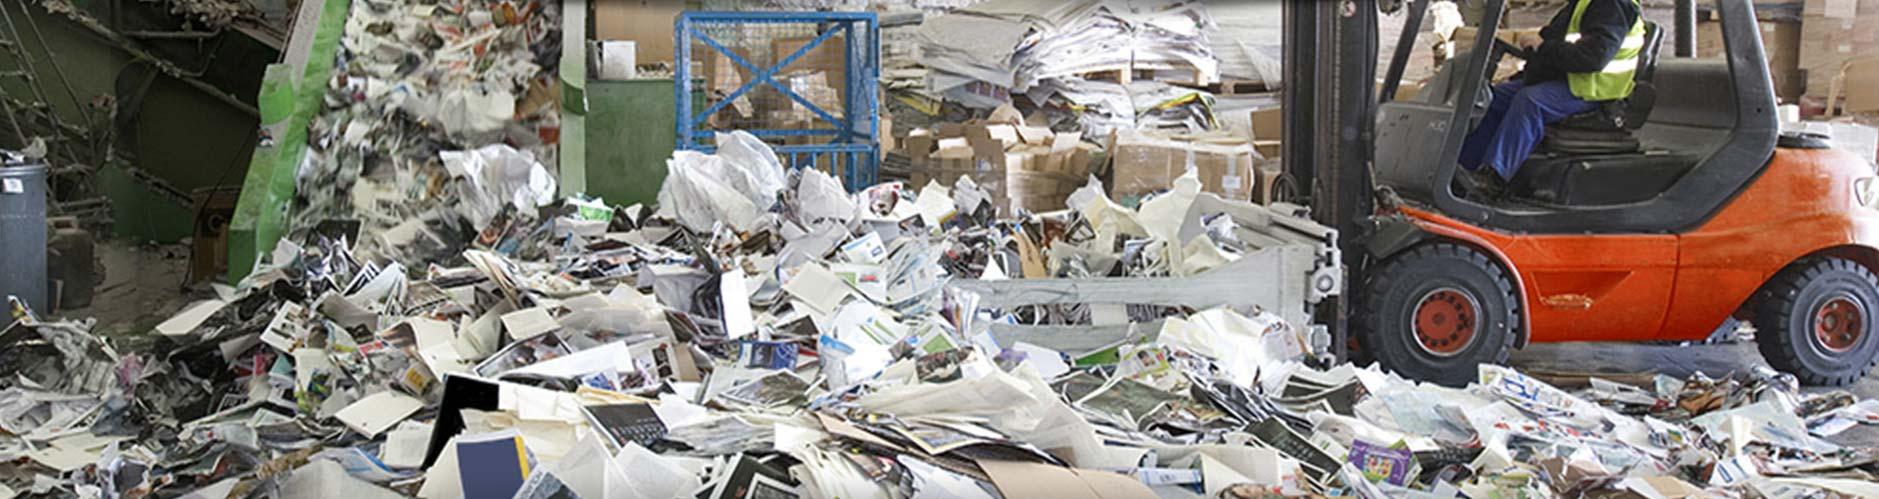 Rua Papel gestión integral de residuos toro mecánico recogiendo papel slide